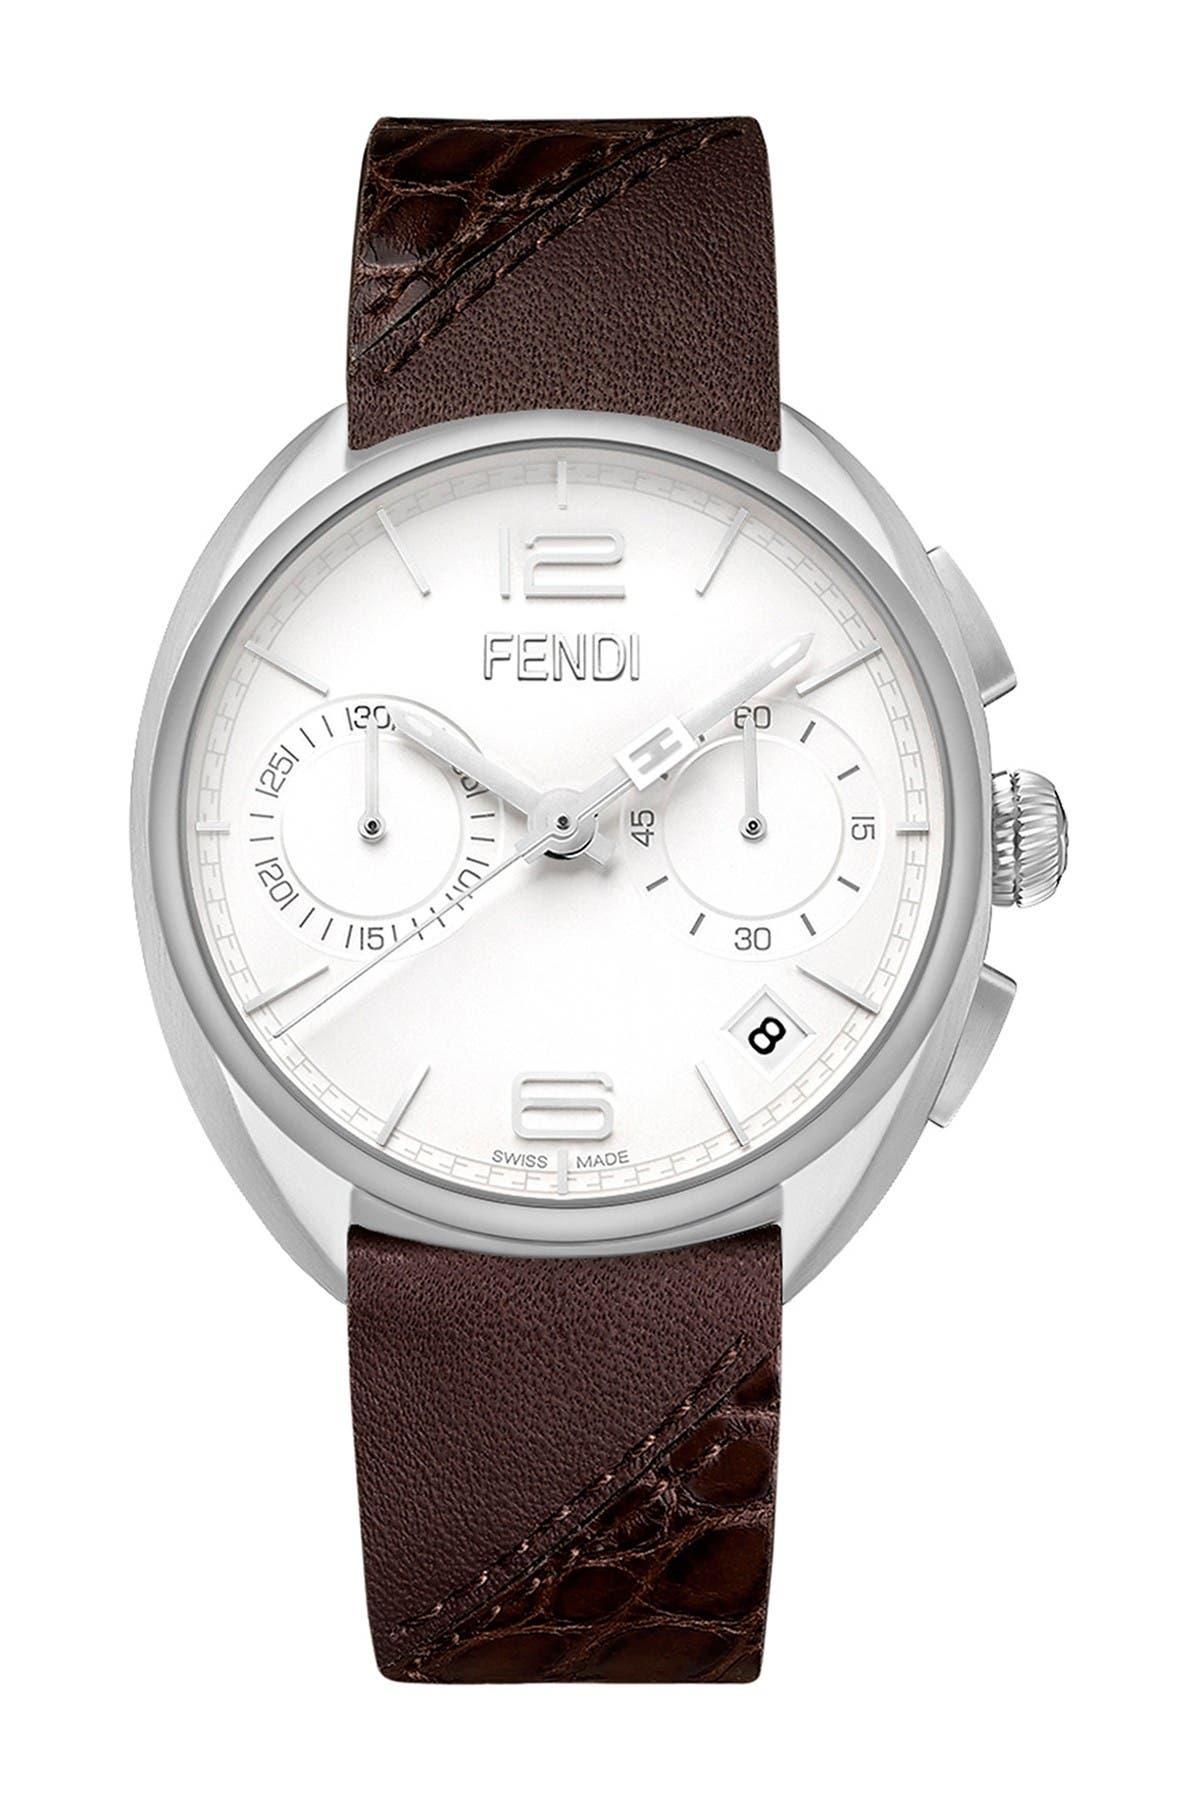 Image of FENDI Men's Momento Genuine Alligator & Calfskin Leather Strap Watch, 40 mm